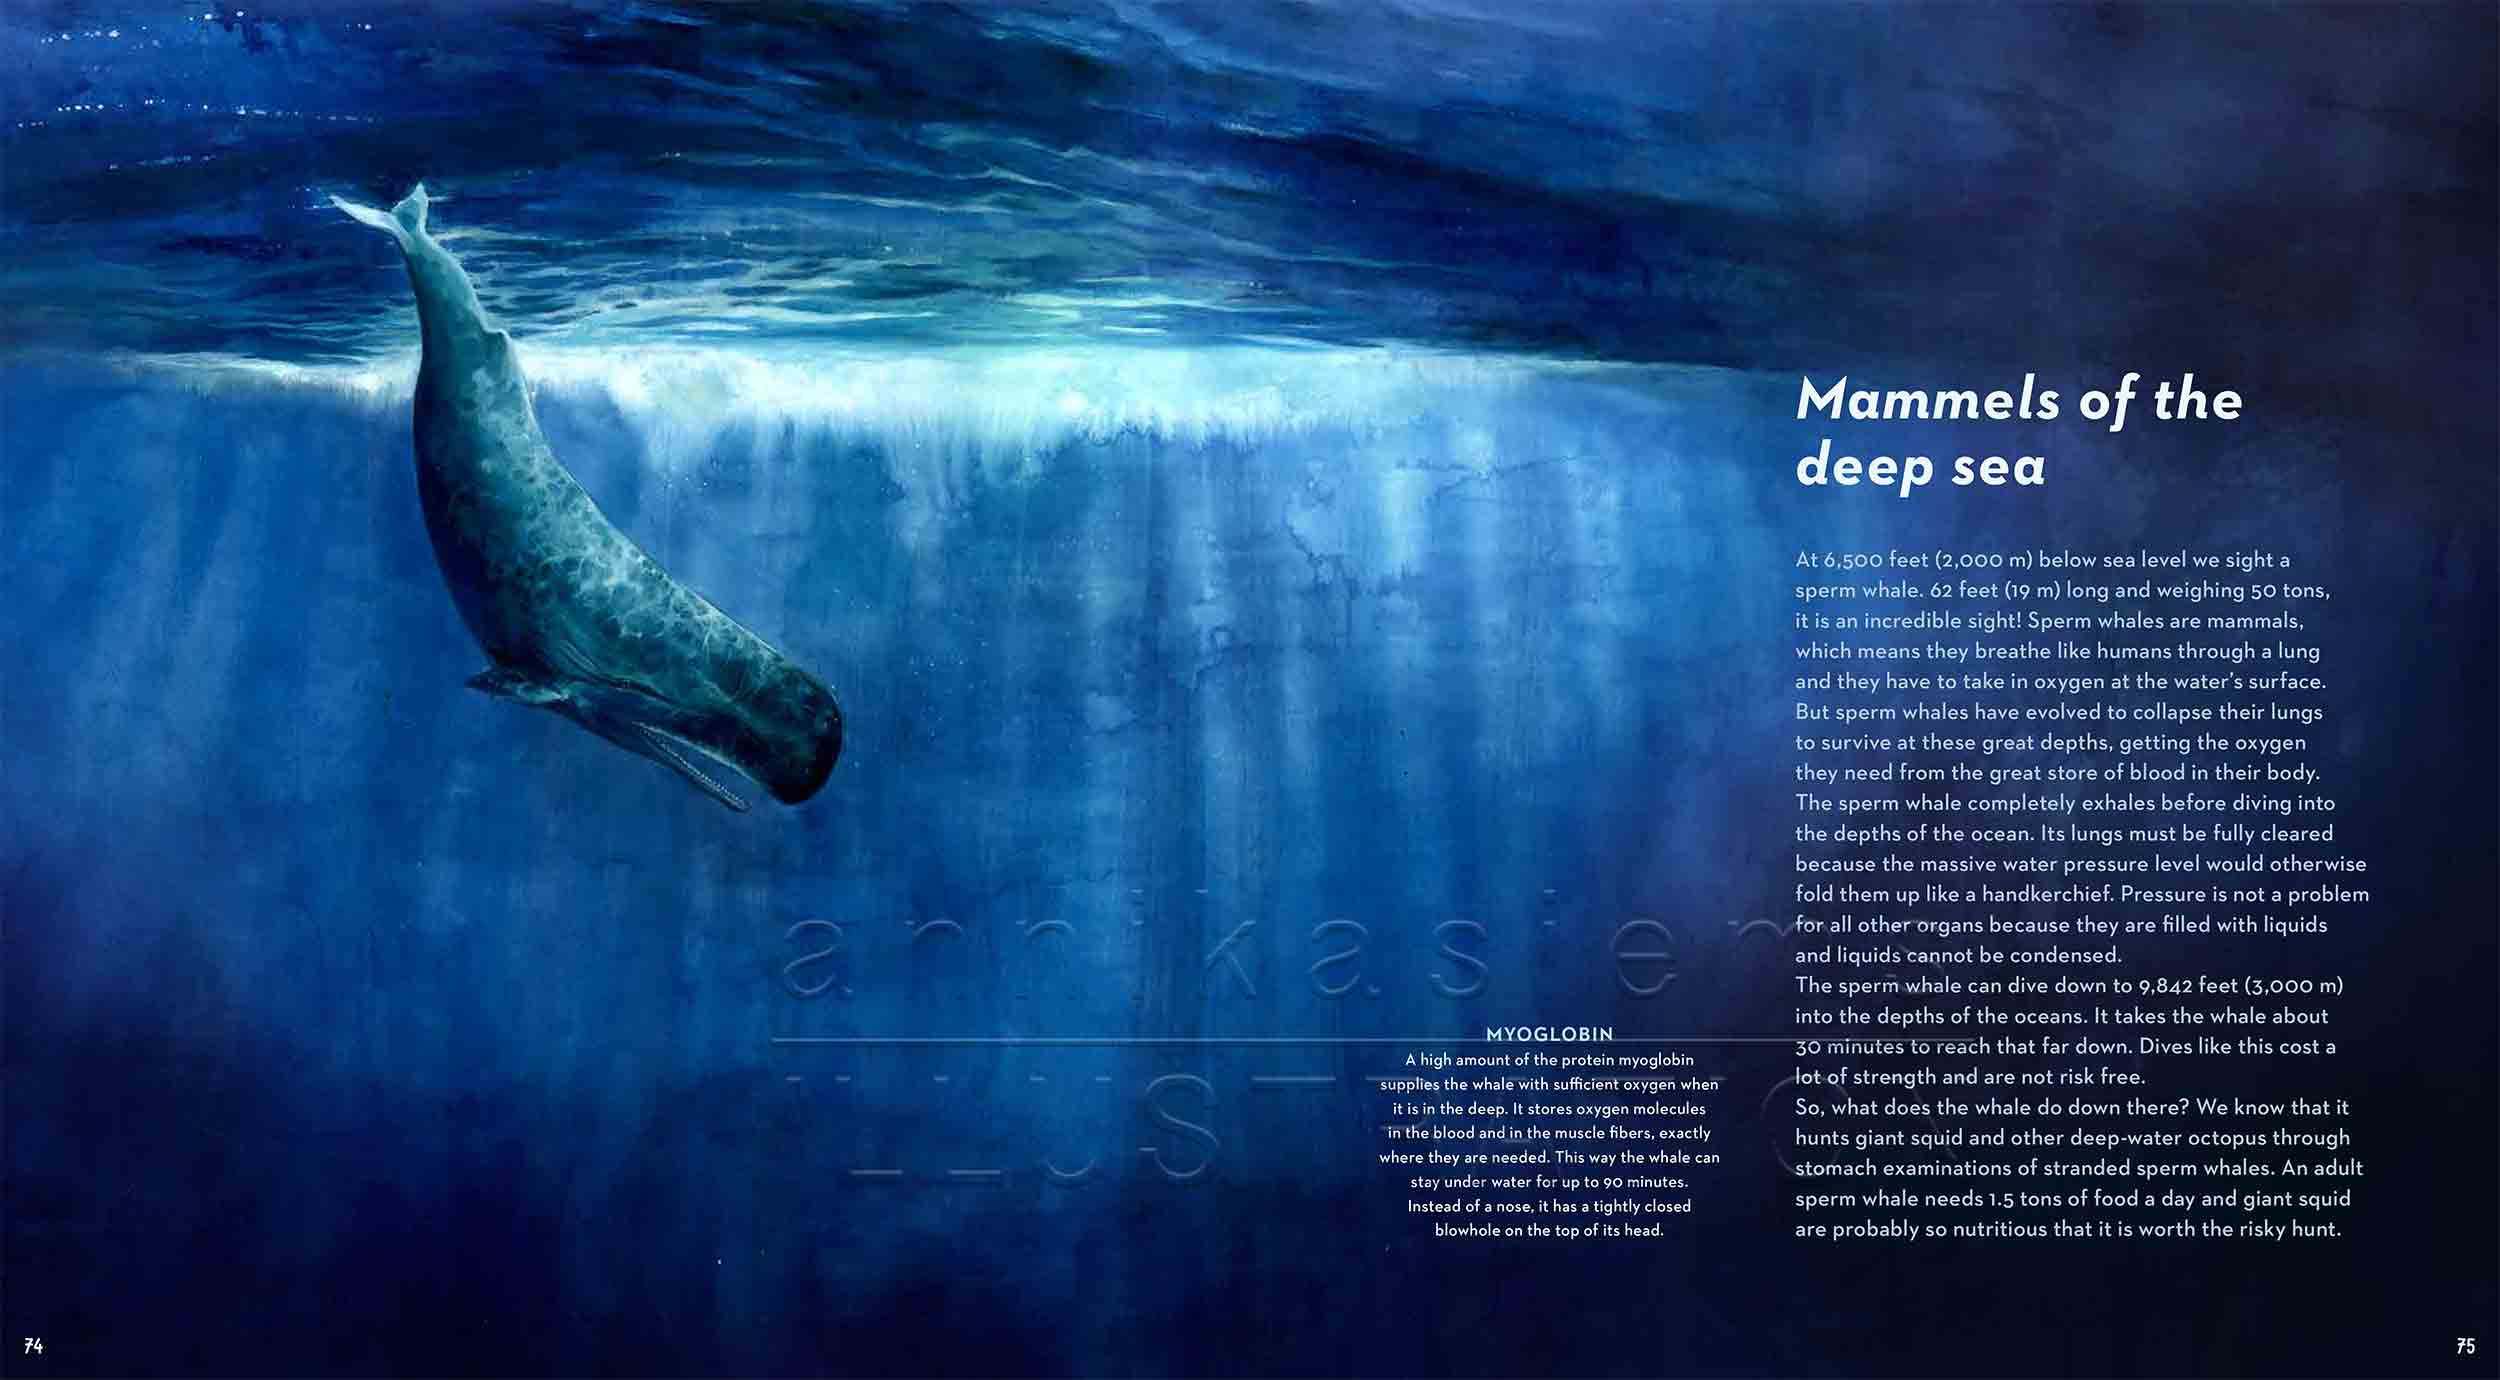 74-75-spermwhale-deep-sea-Englisch-submersible-©annikasiems-plankton_deepsea-zooplankton.jpg